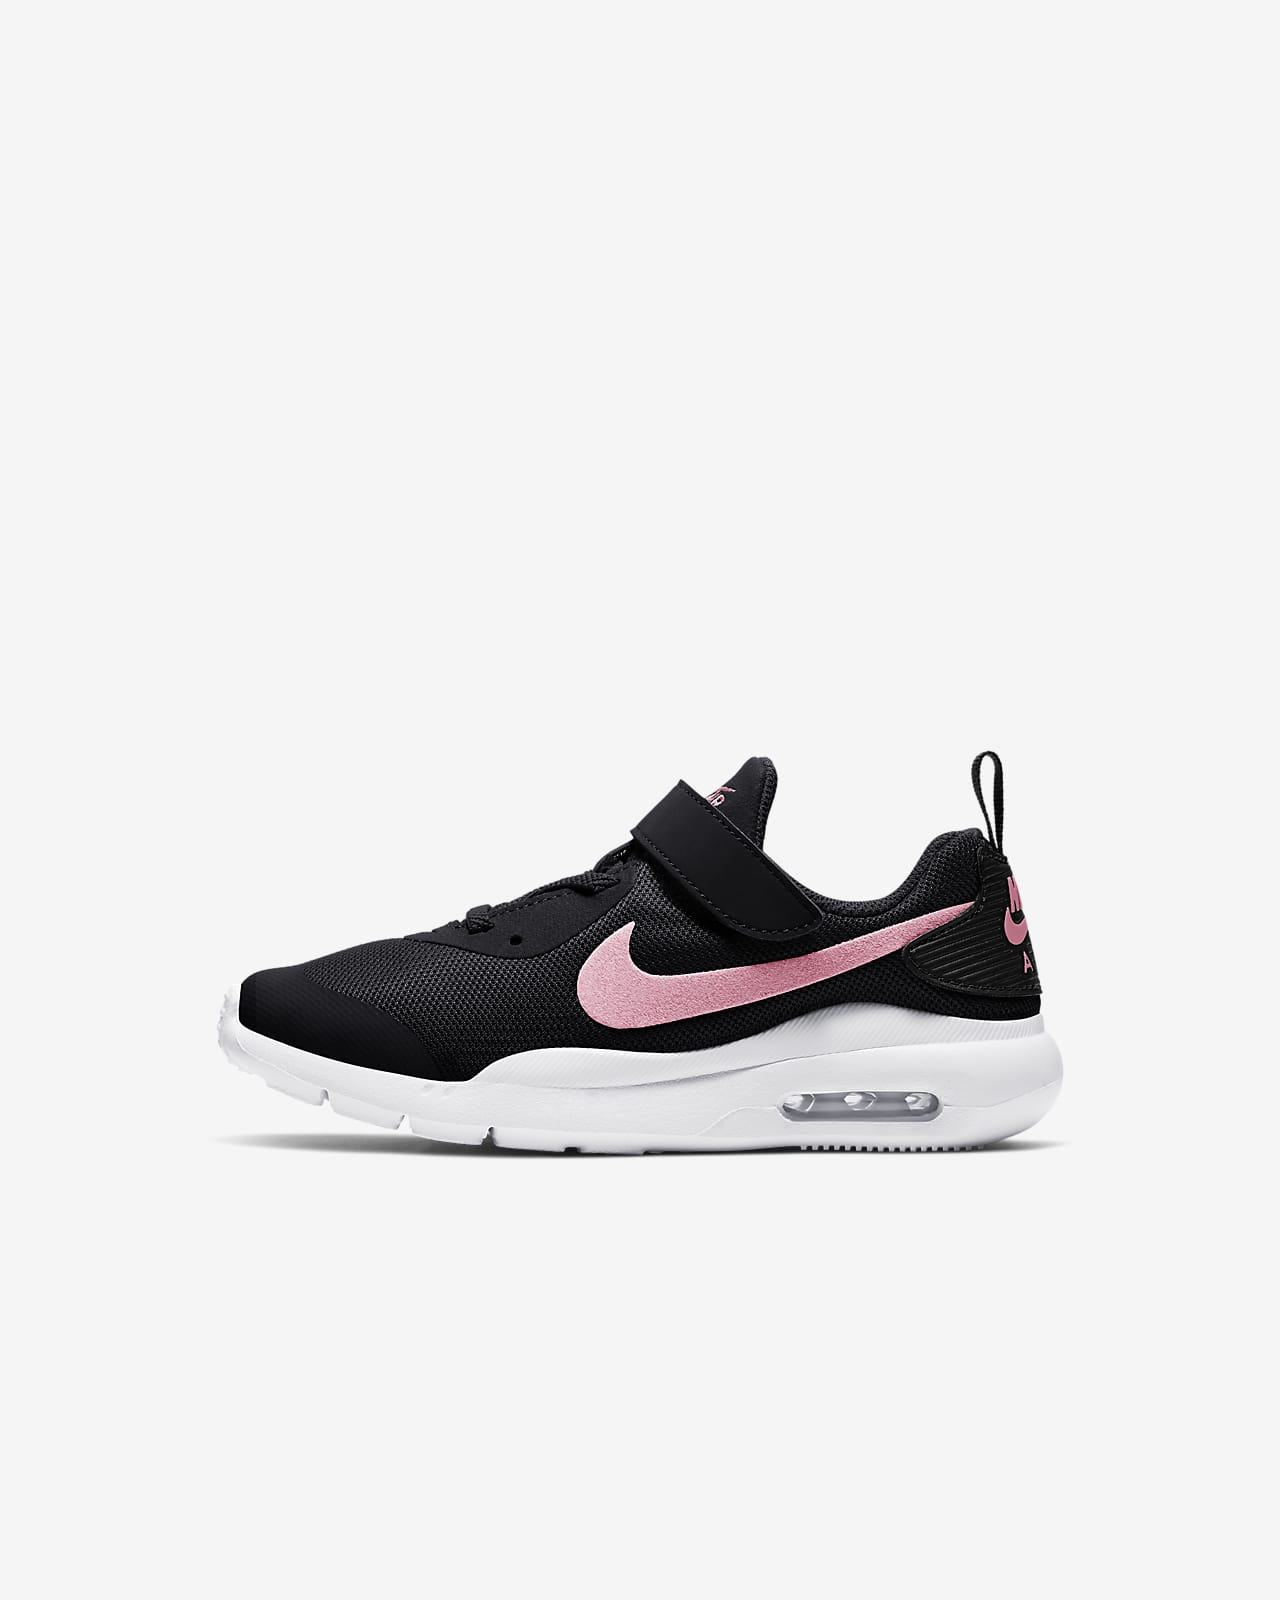 Nike Air Max Oketo Schuh für jüngere Kinder